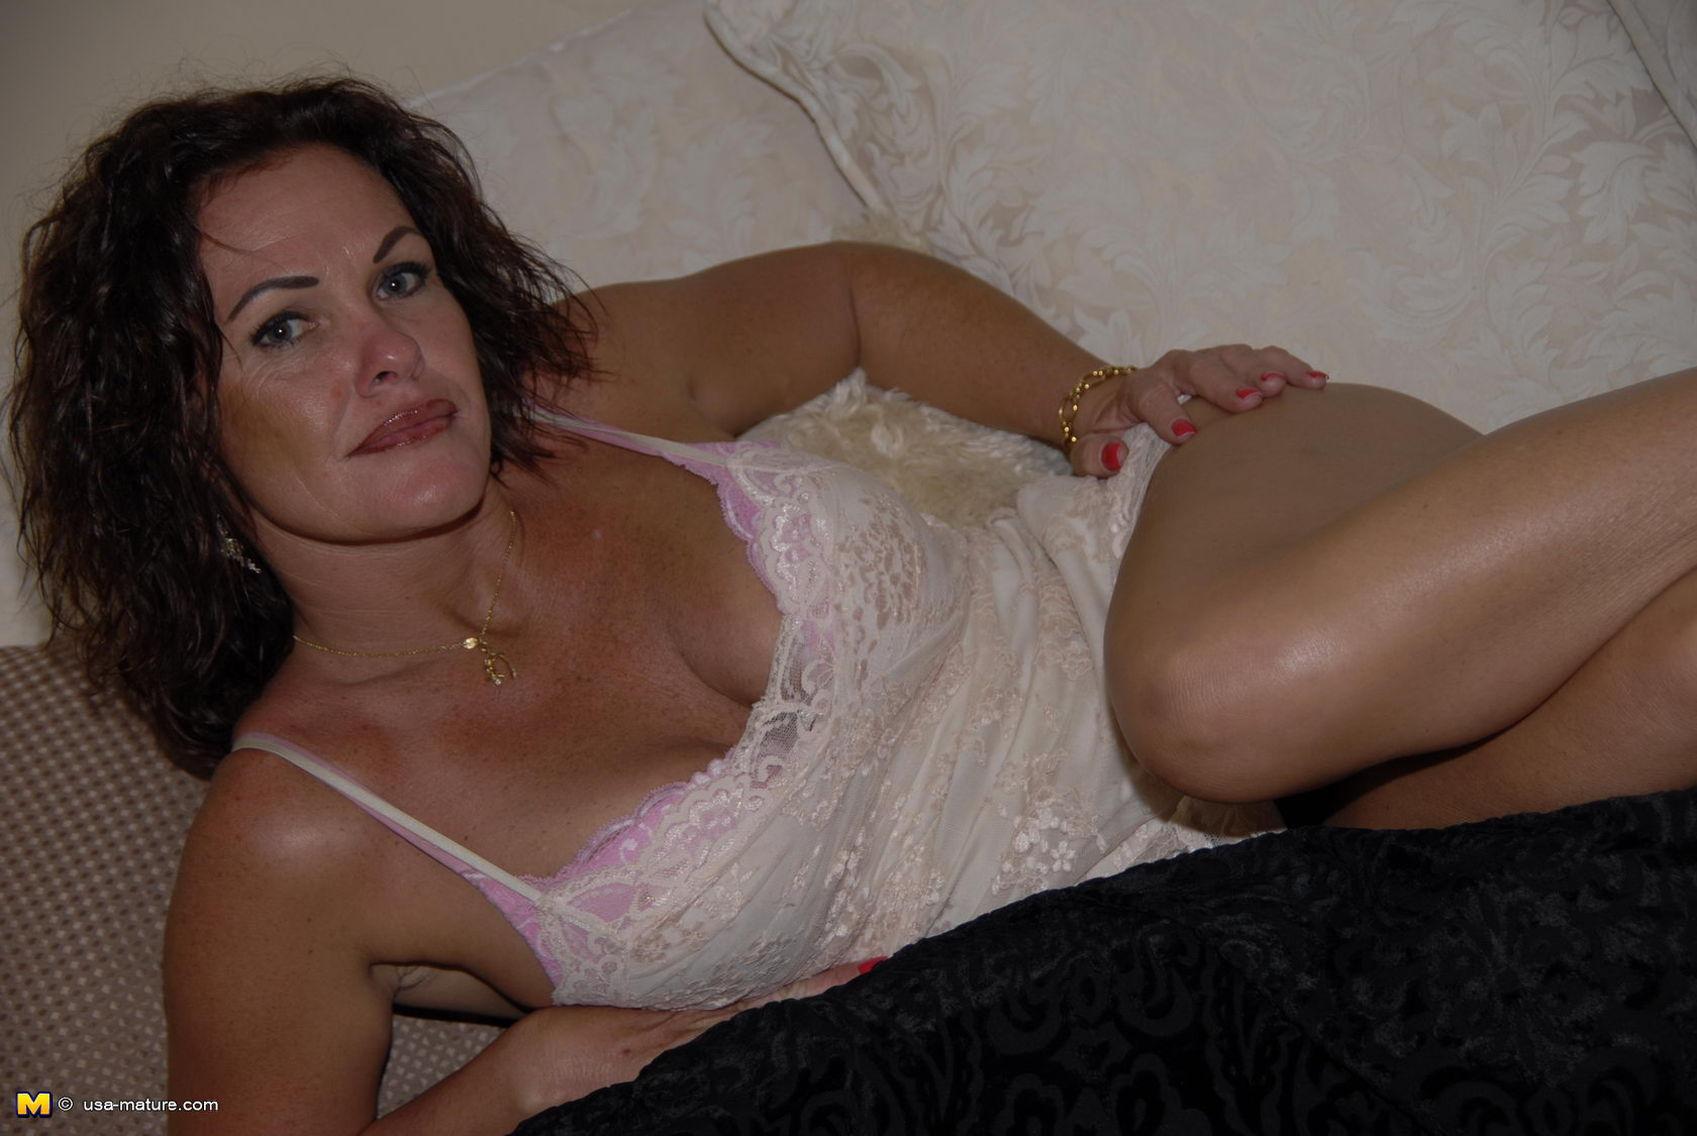 мария кожевникова фотки эротика